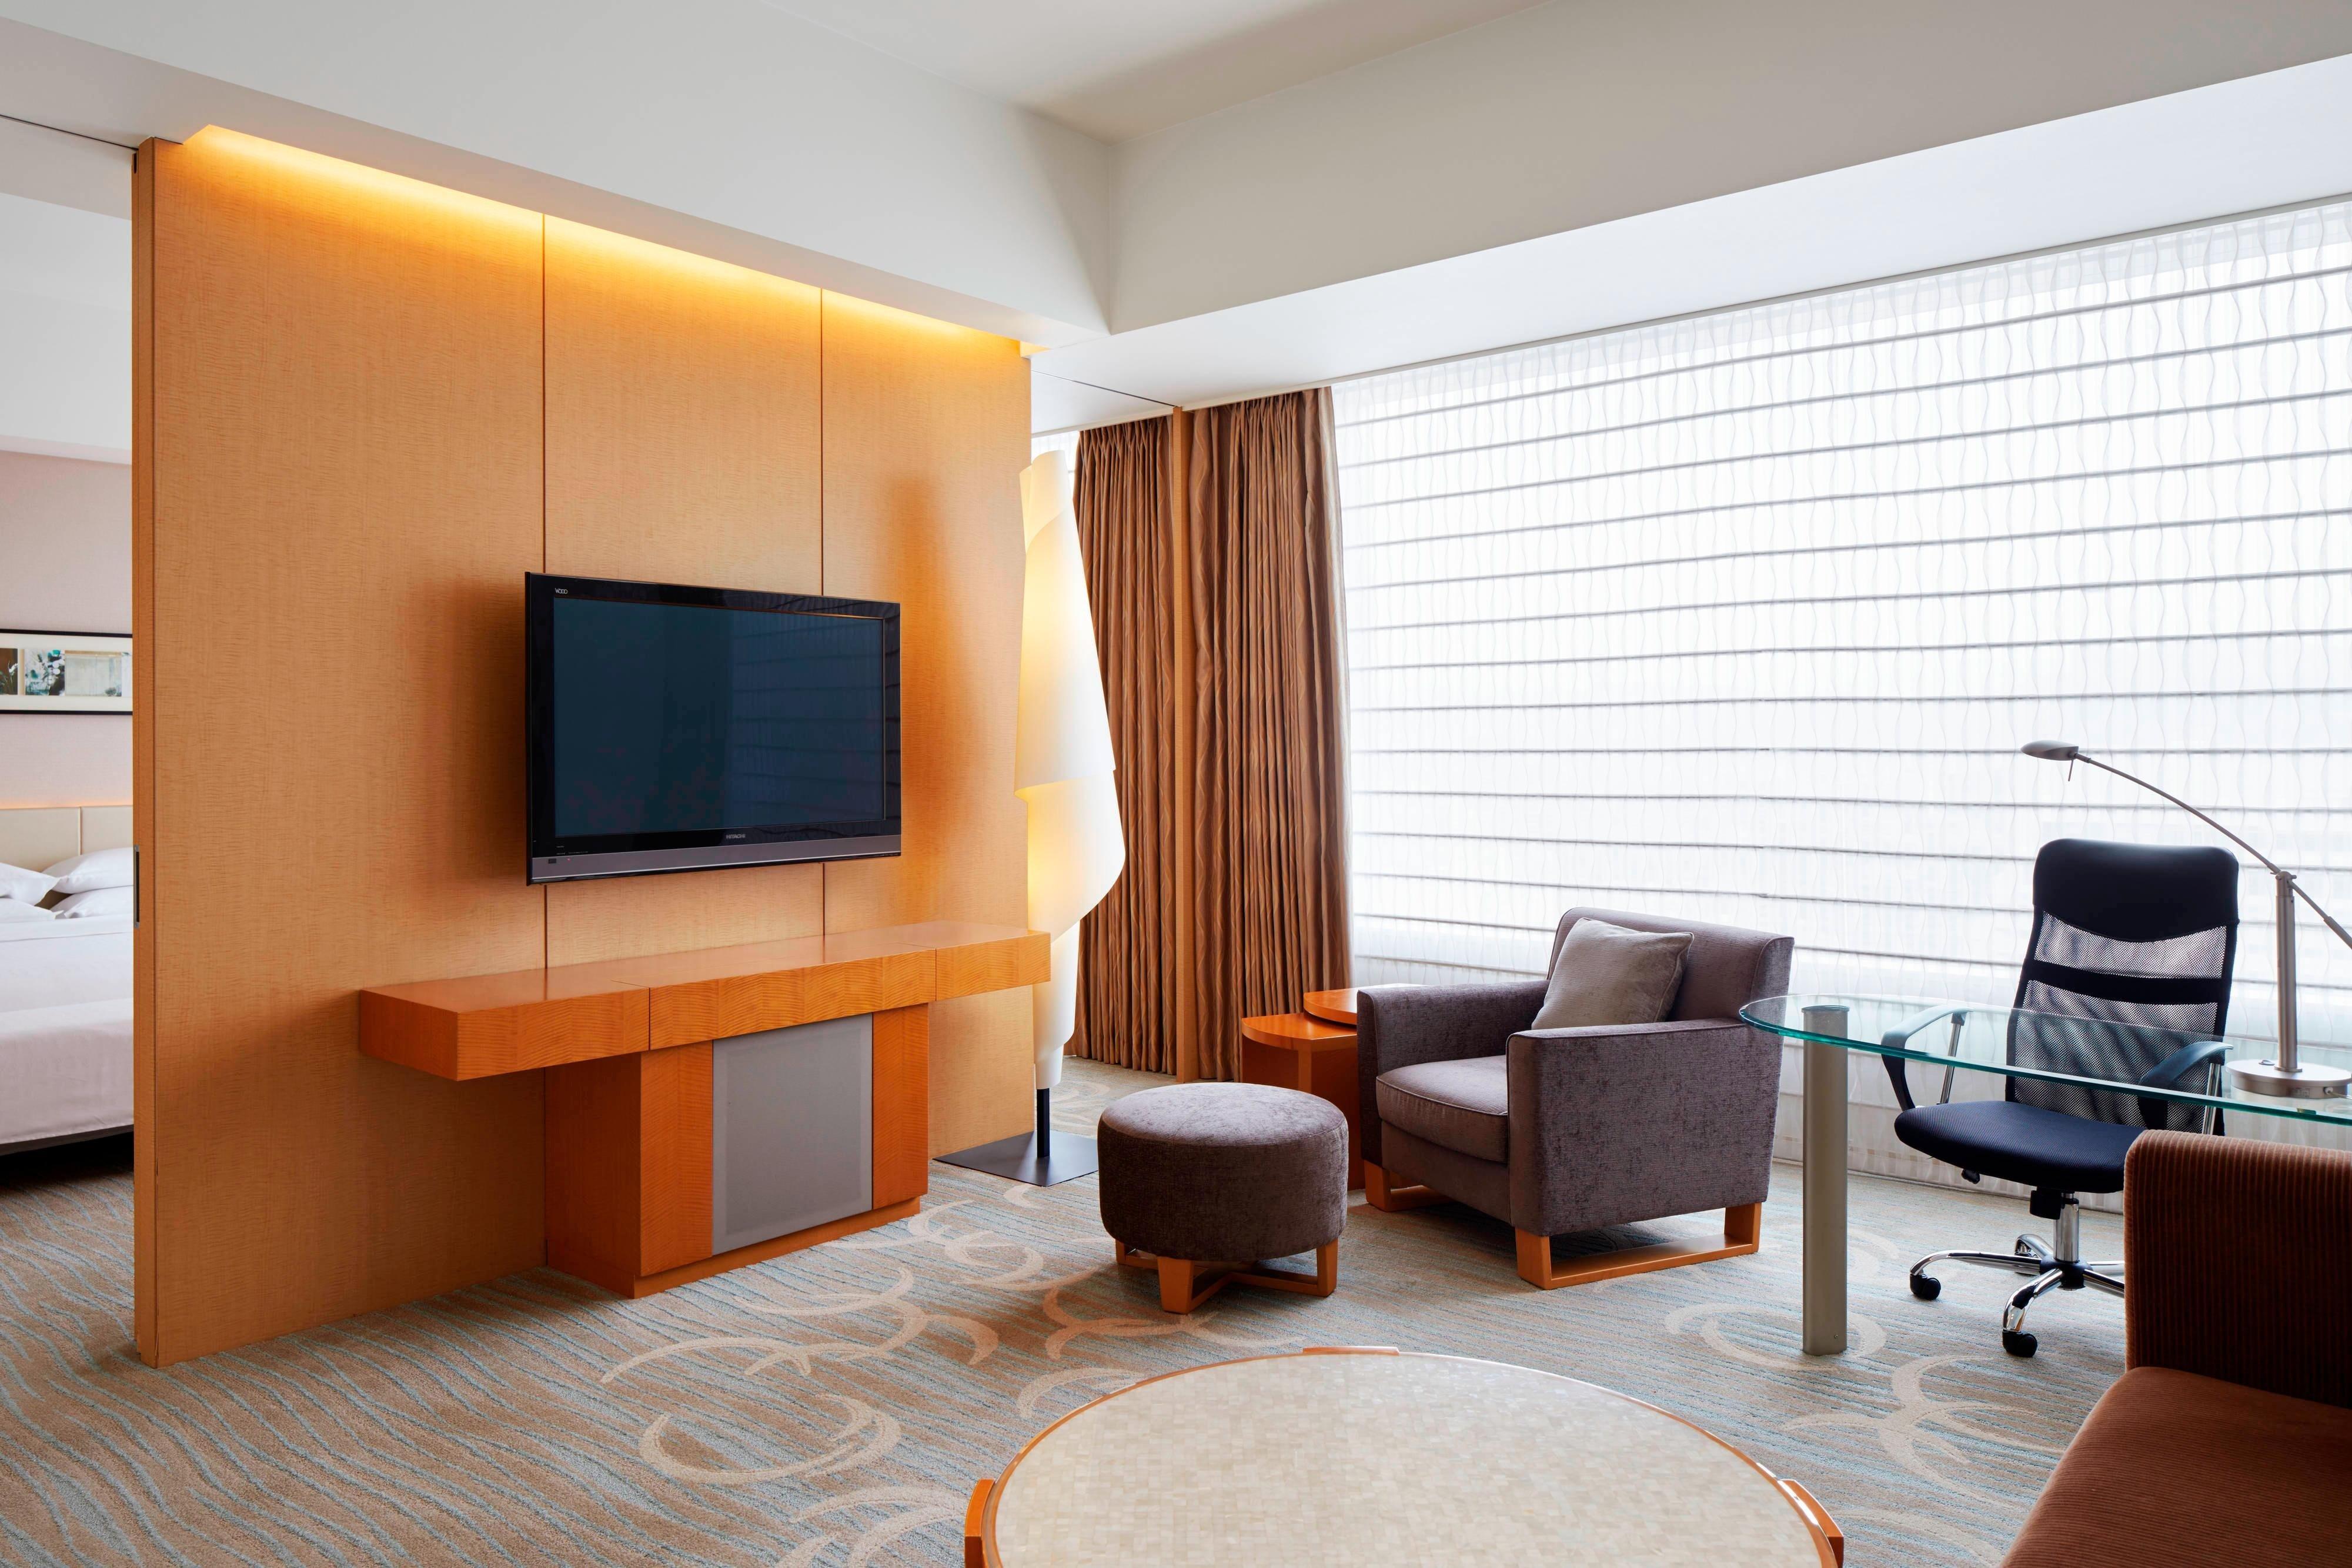 Sheraton Grand Hiroshima Hotel Hiroshima Price Address Reviews